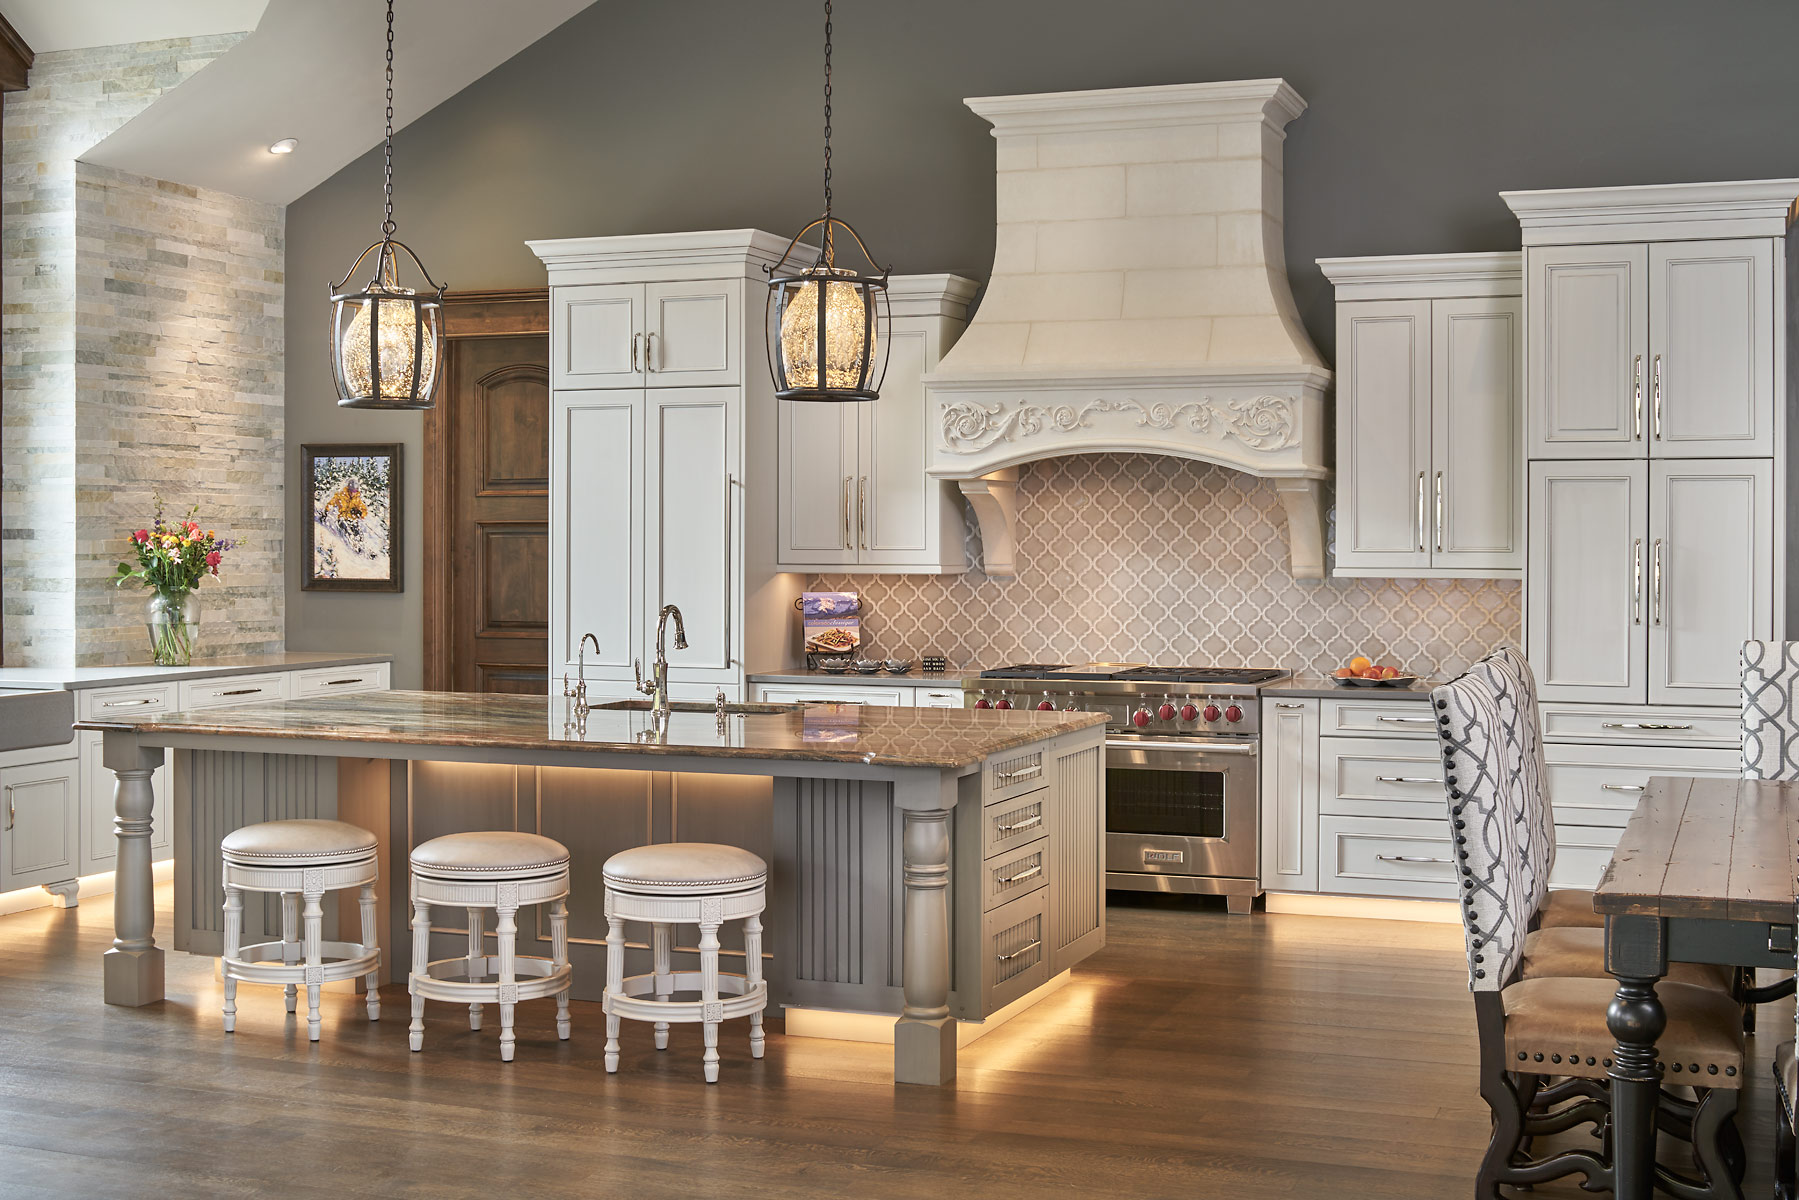 McCoy-Design-Neolith-Edwards-9-22-17-Kitchen-Dining-Web.jpg